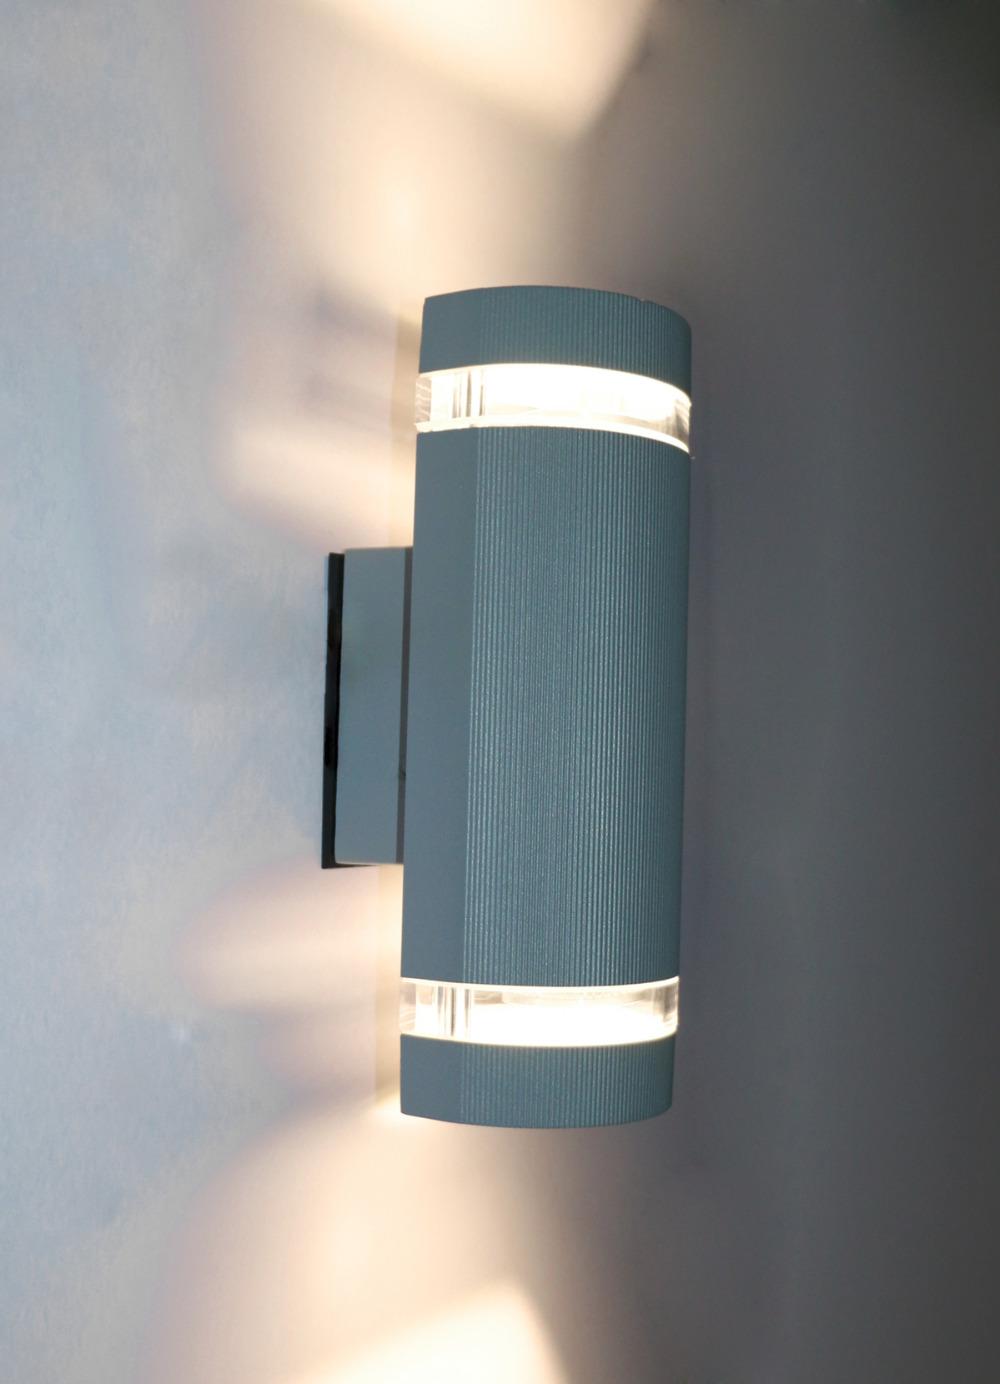 Aliexpress.com : Buy 14W Semi Cylinder Up/Down Indoor/Outdoor Exterior Garden Wall Light Sconce ...